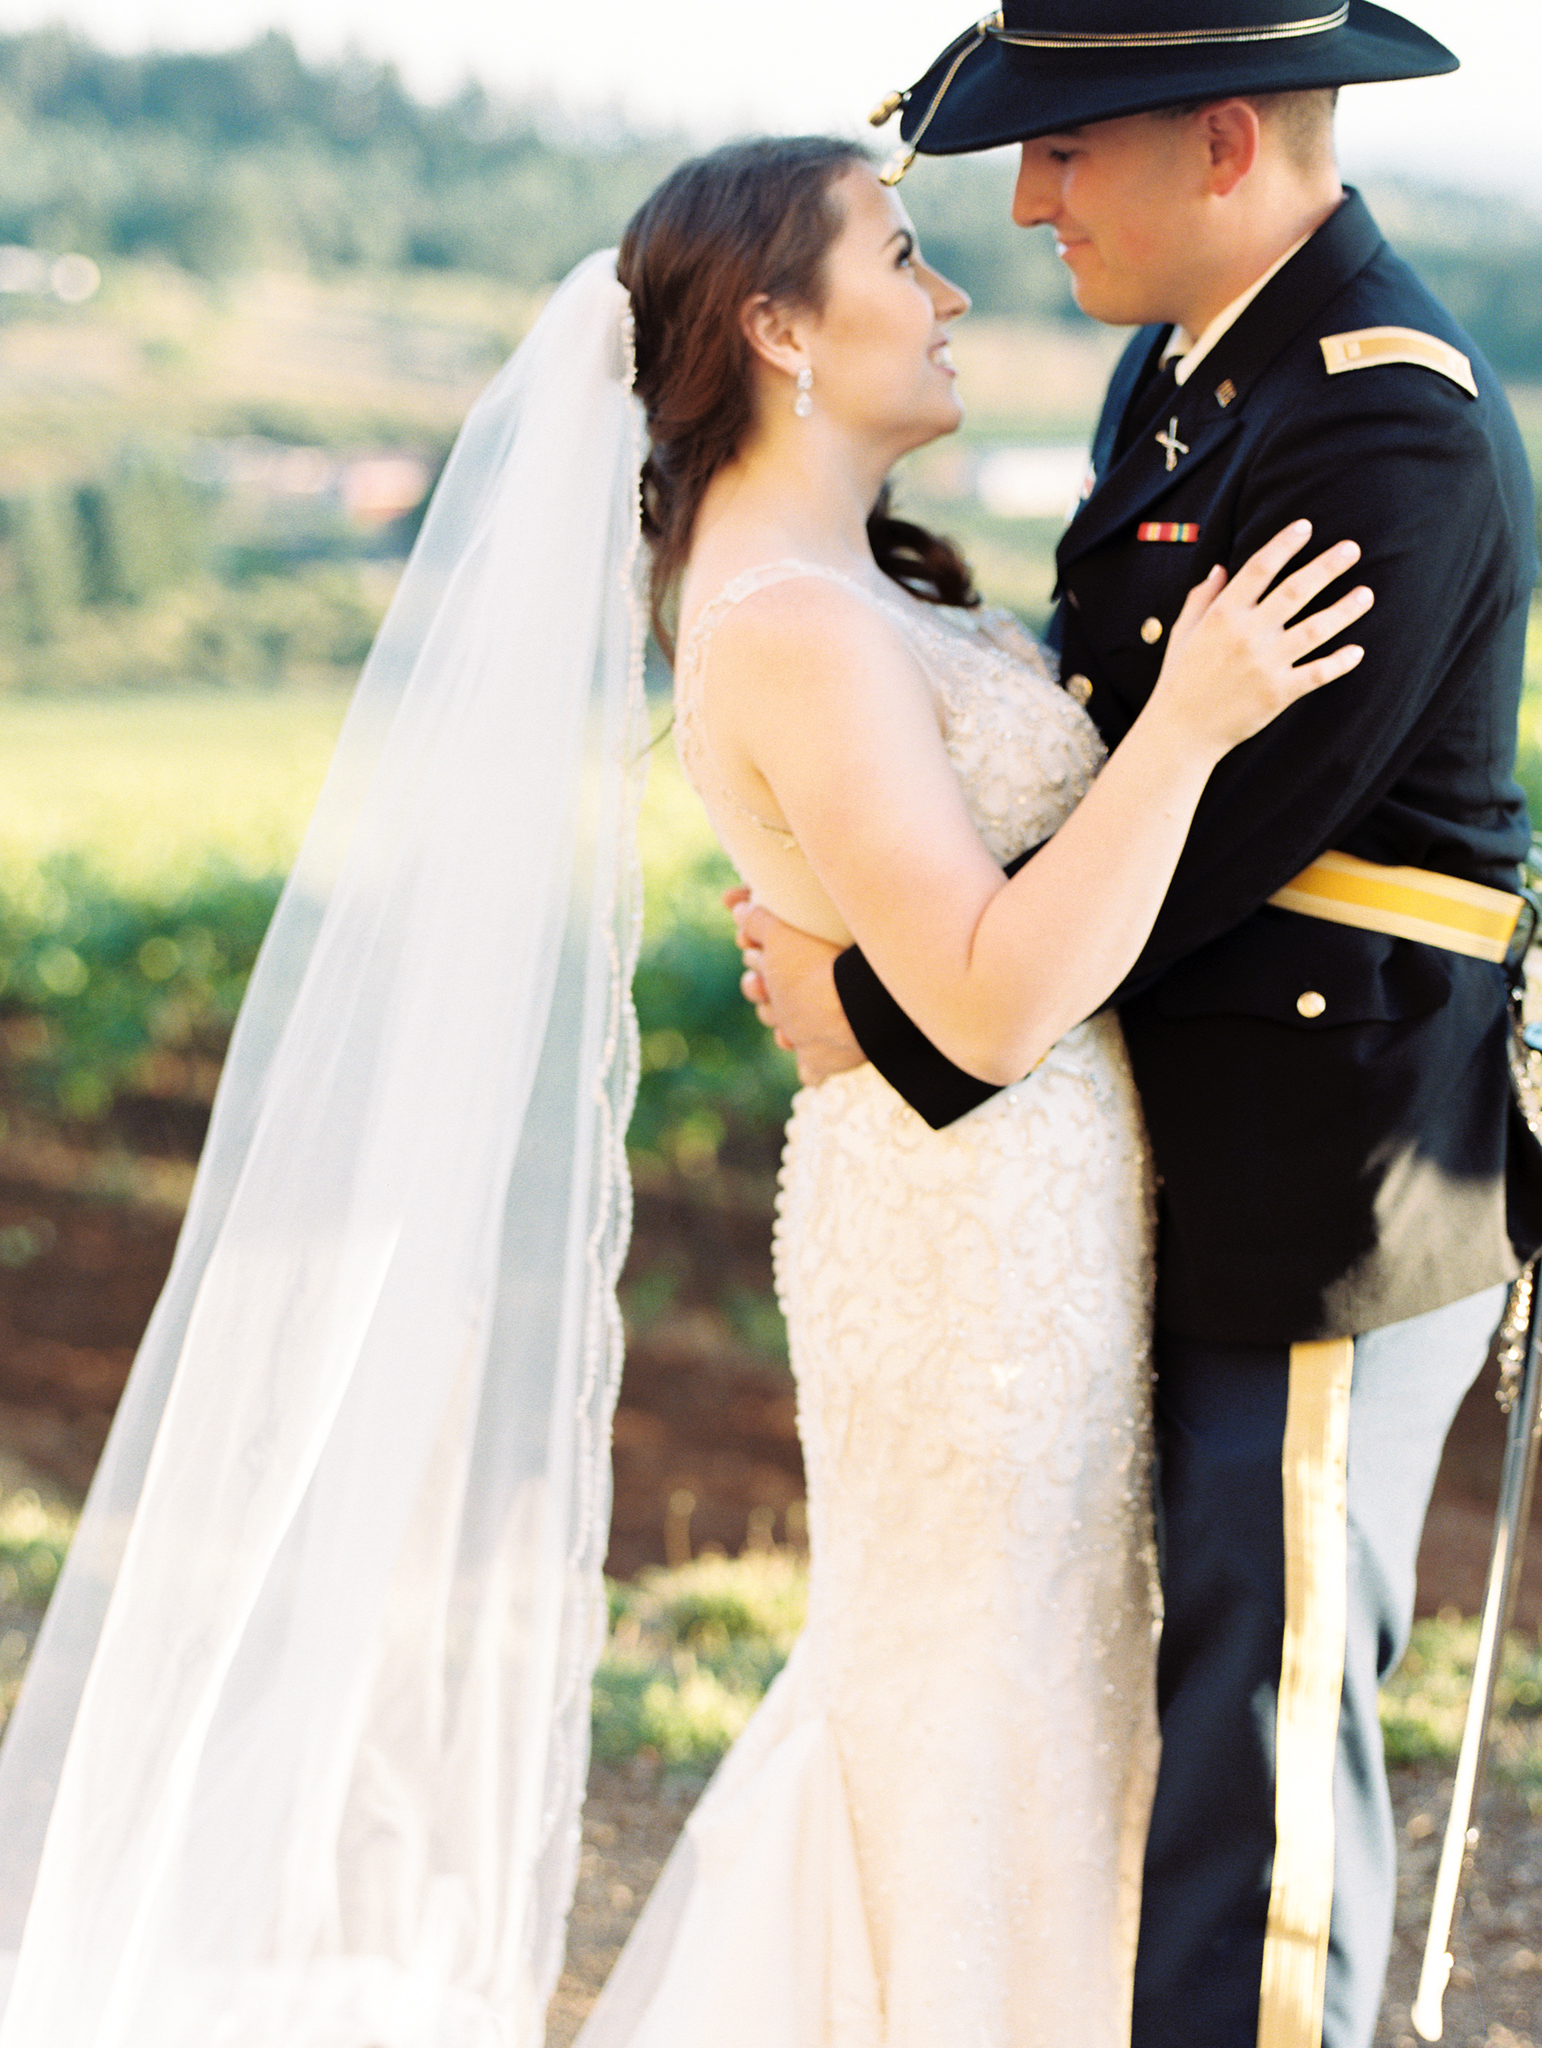 romantic-willamette-valley-vineyards-wedding-photography-47.jpg